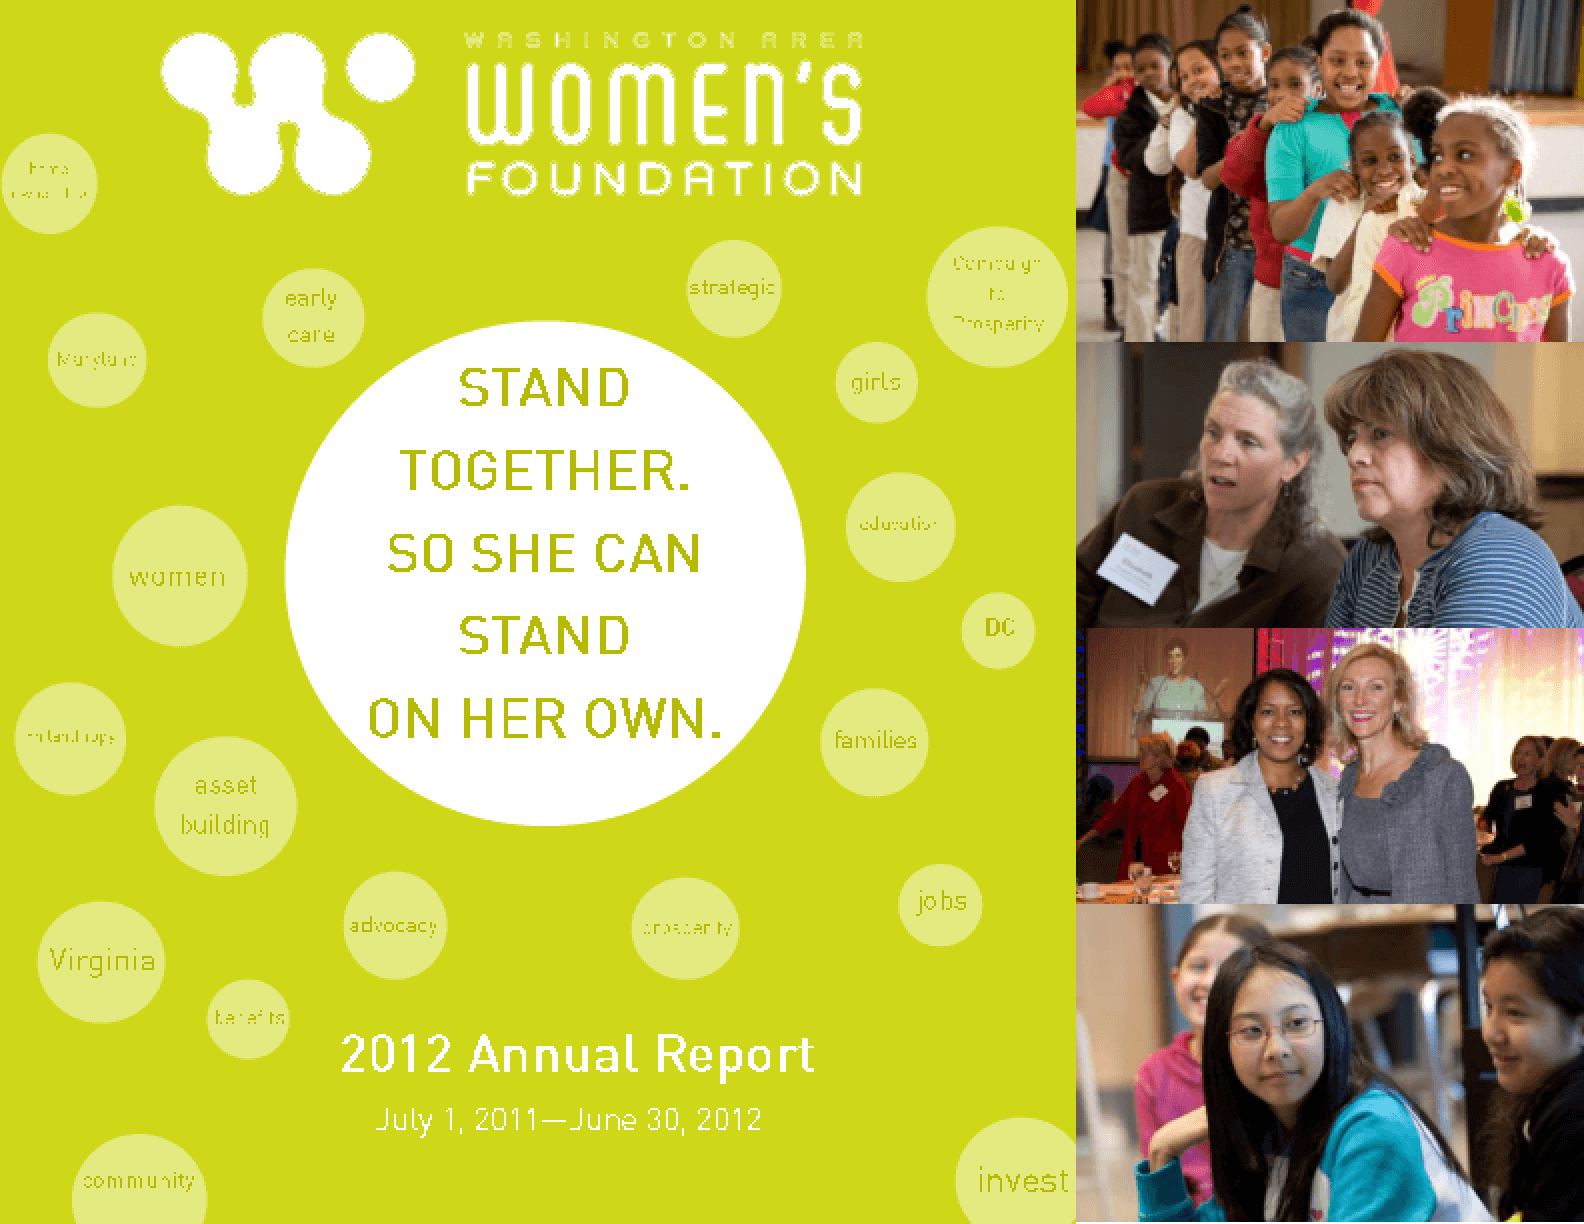 Washington Area Women's Foundation 2012 Annual Report